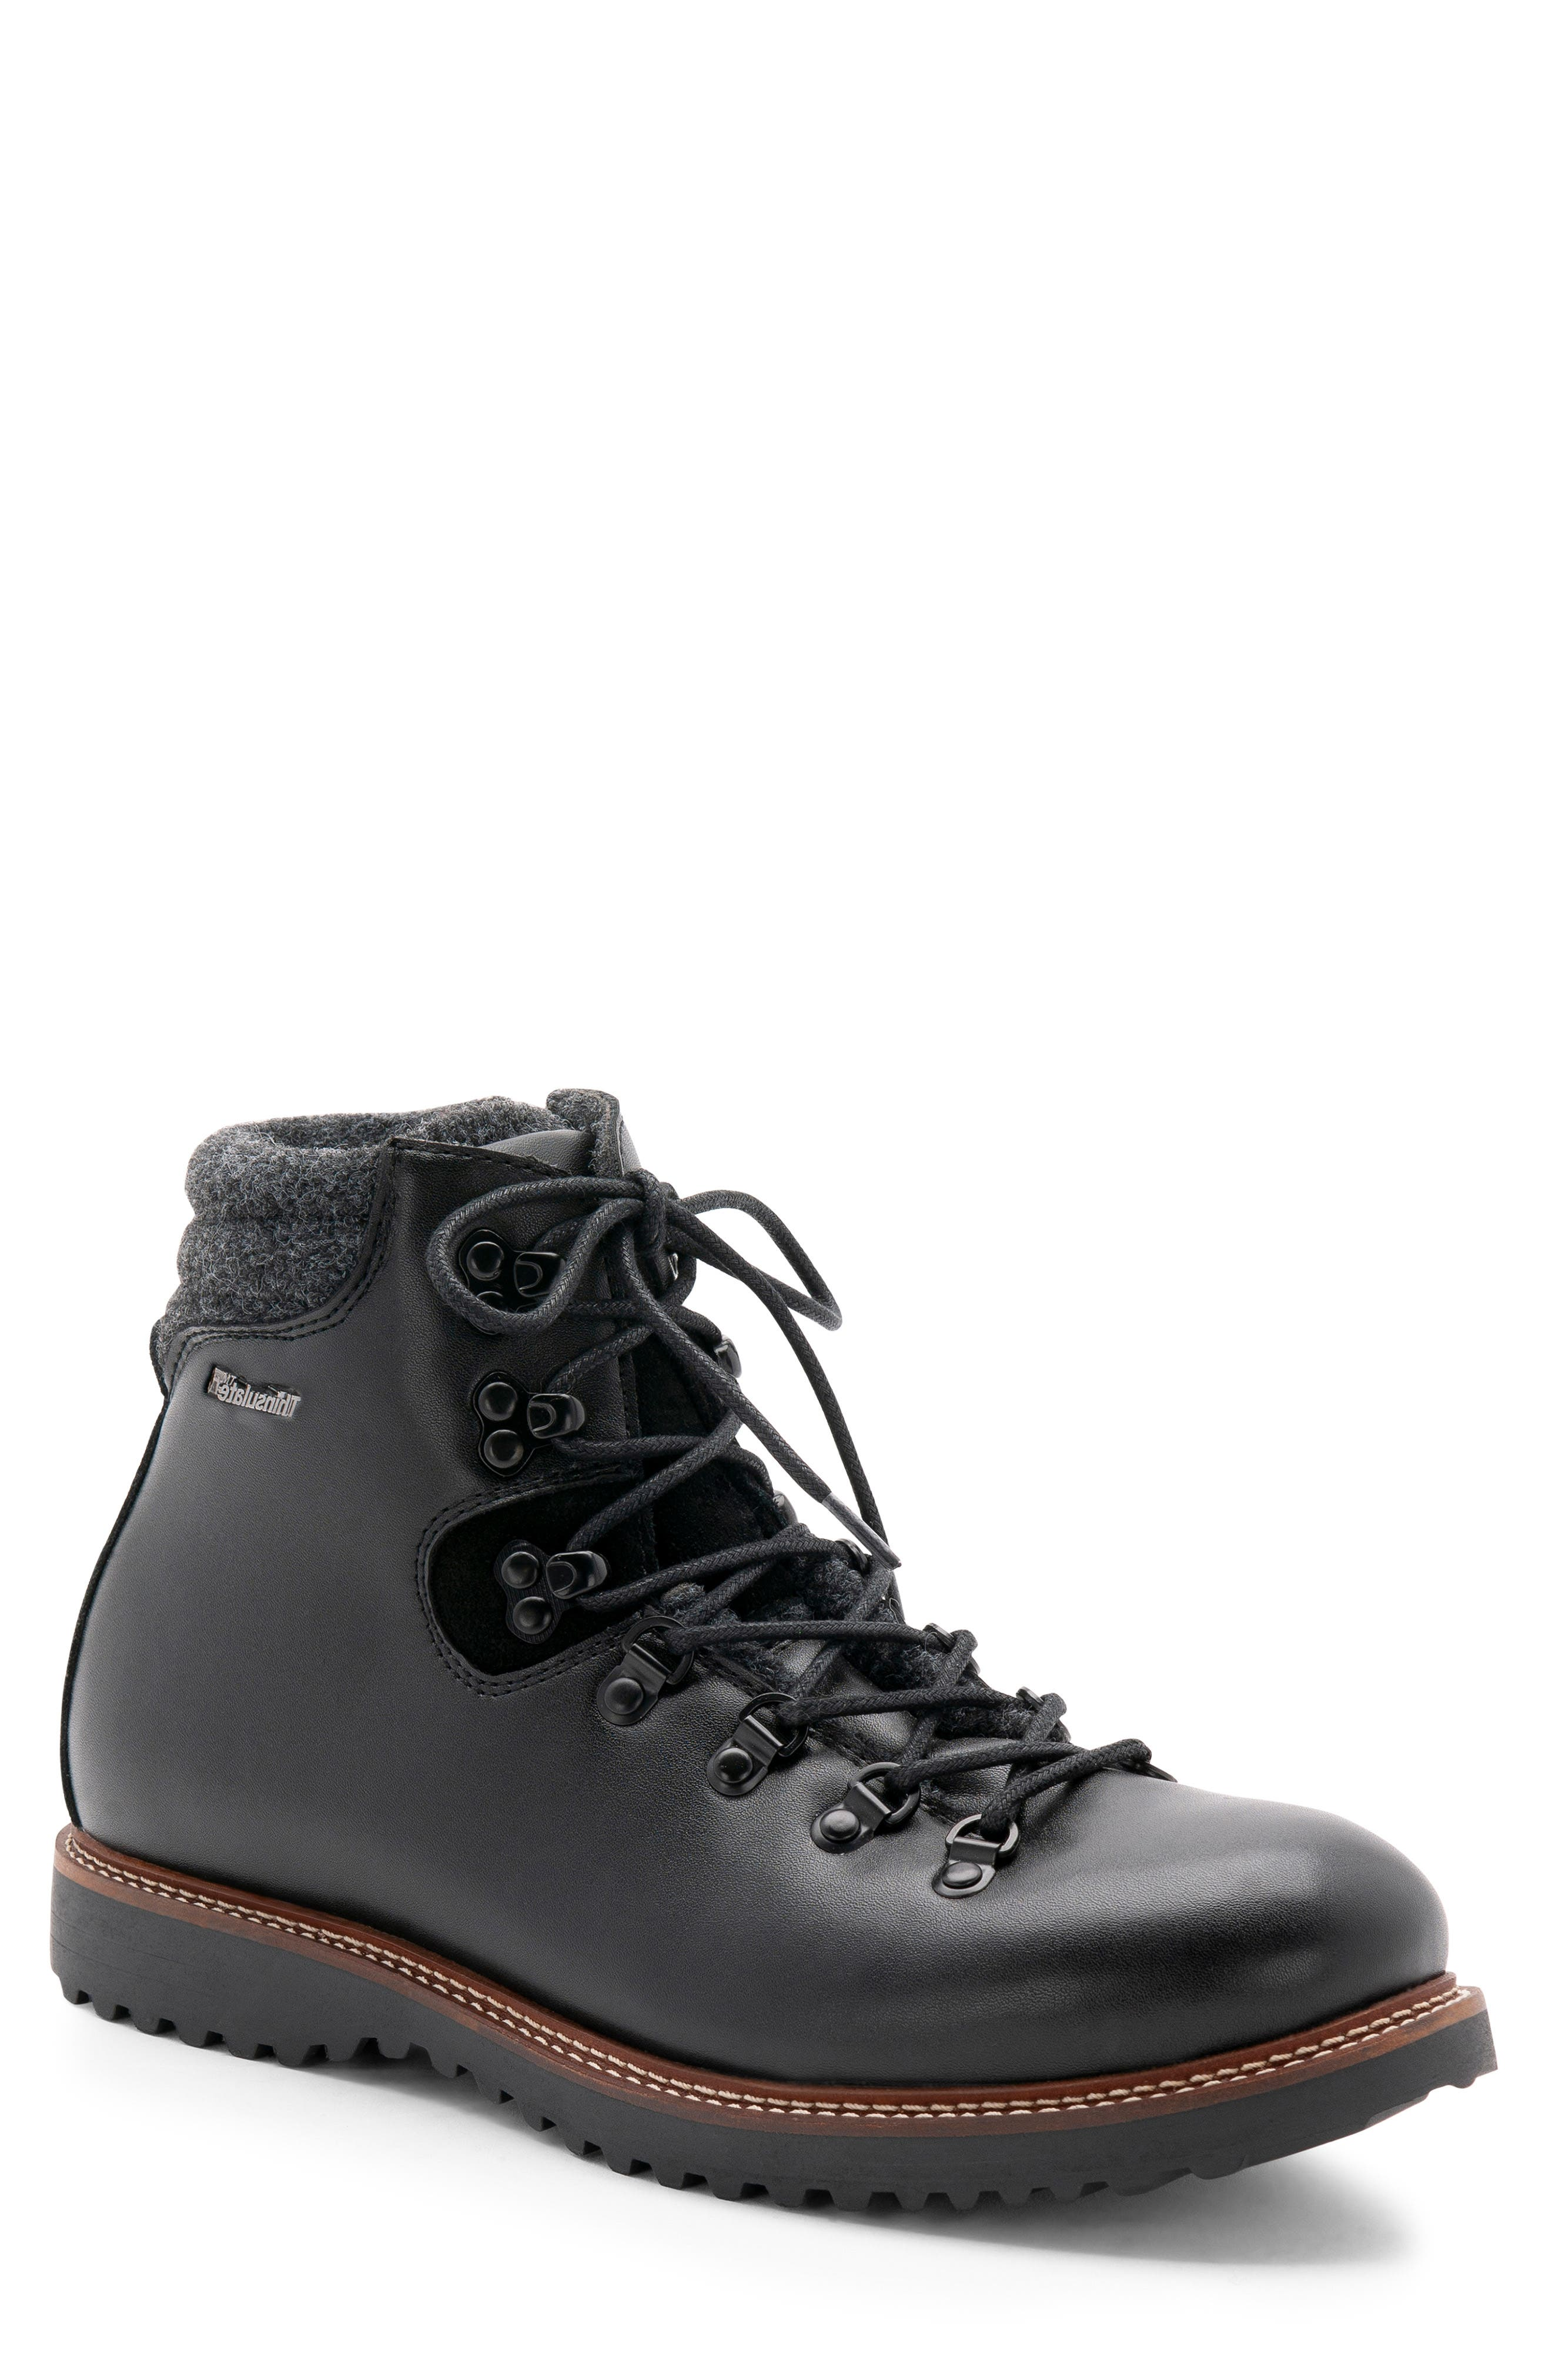 BLONDO Morgan Waterproof Plain Toe Boot, Main, color, BLACK LEATHER